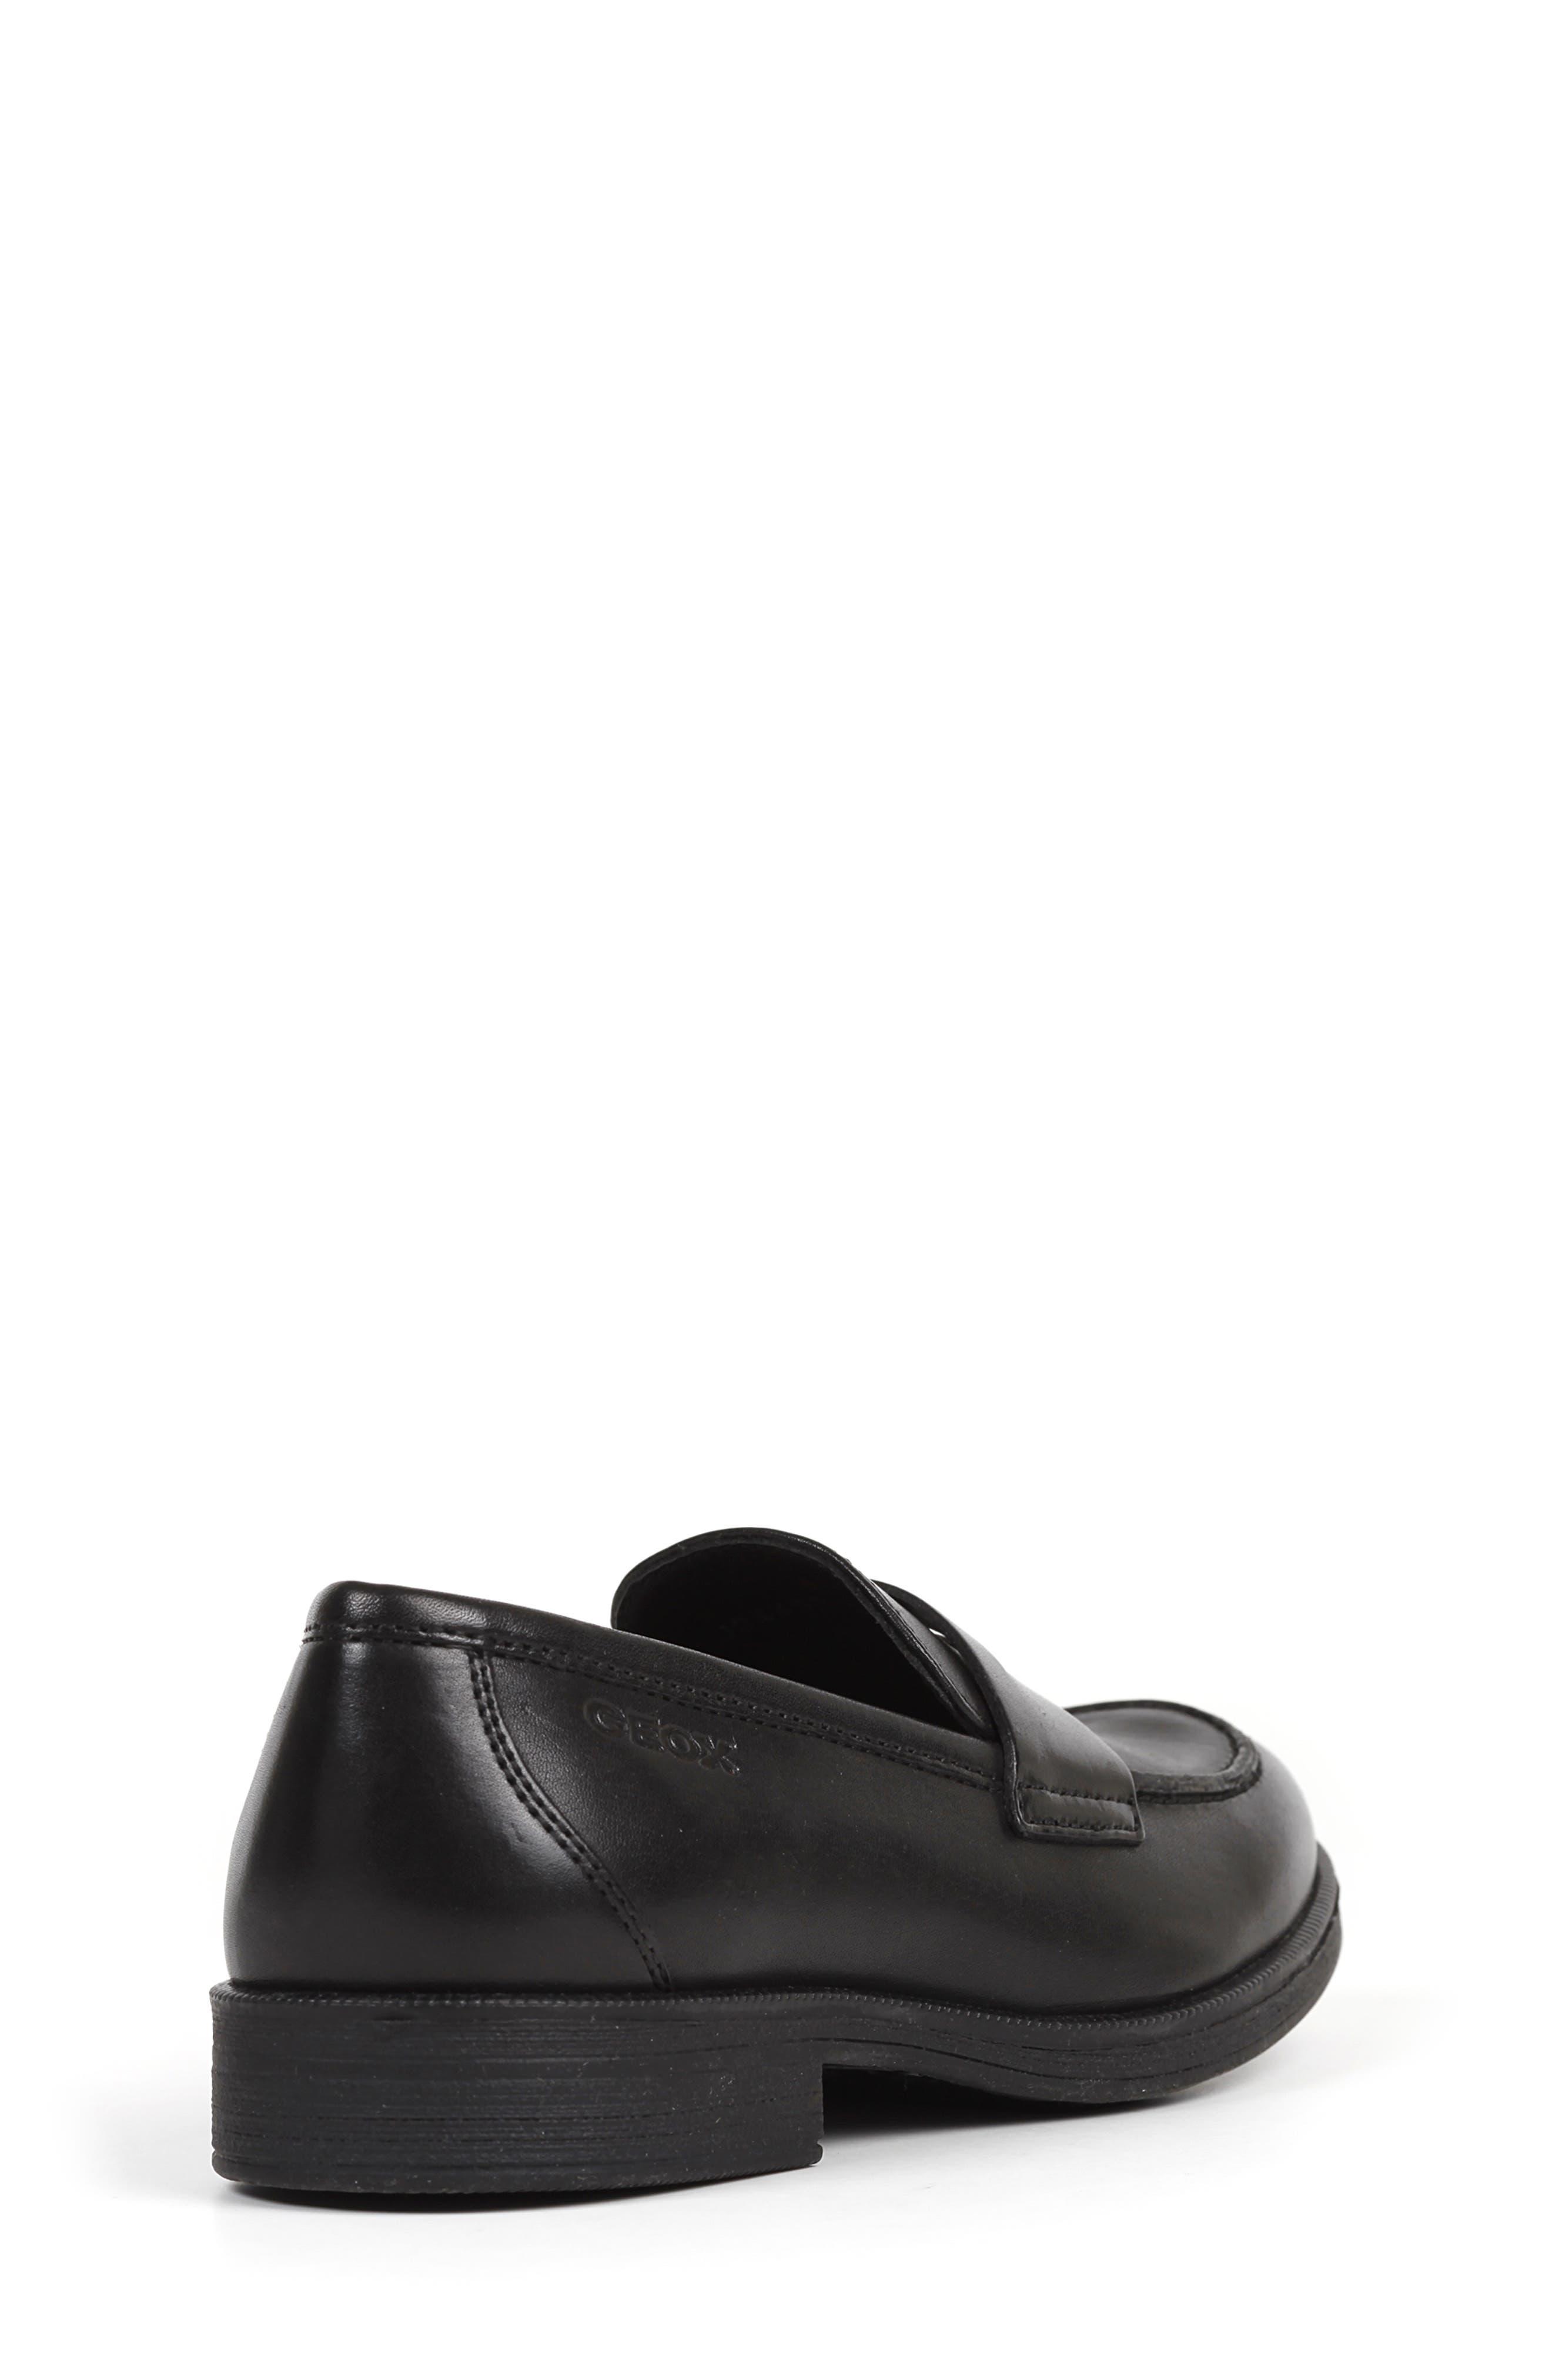 Agata 1 Penny Loafer,                             Alternate thumbnail 5, color,                             BLACK